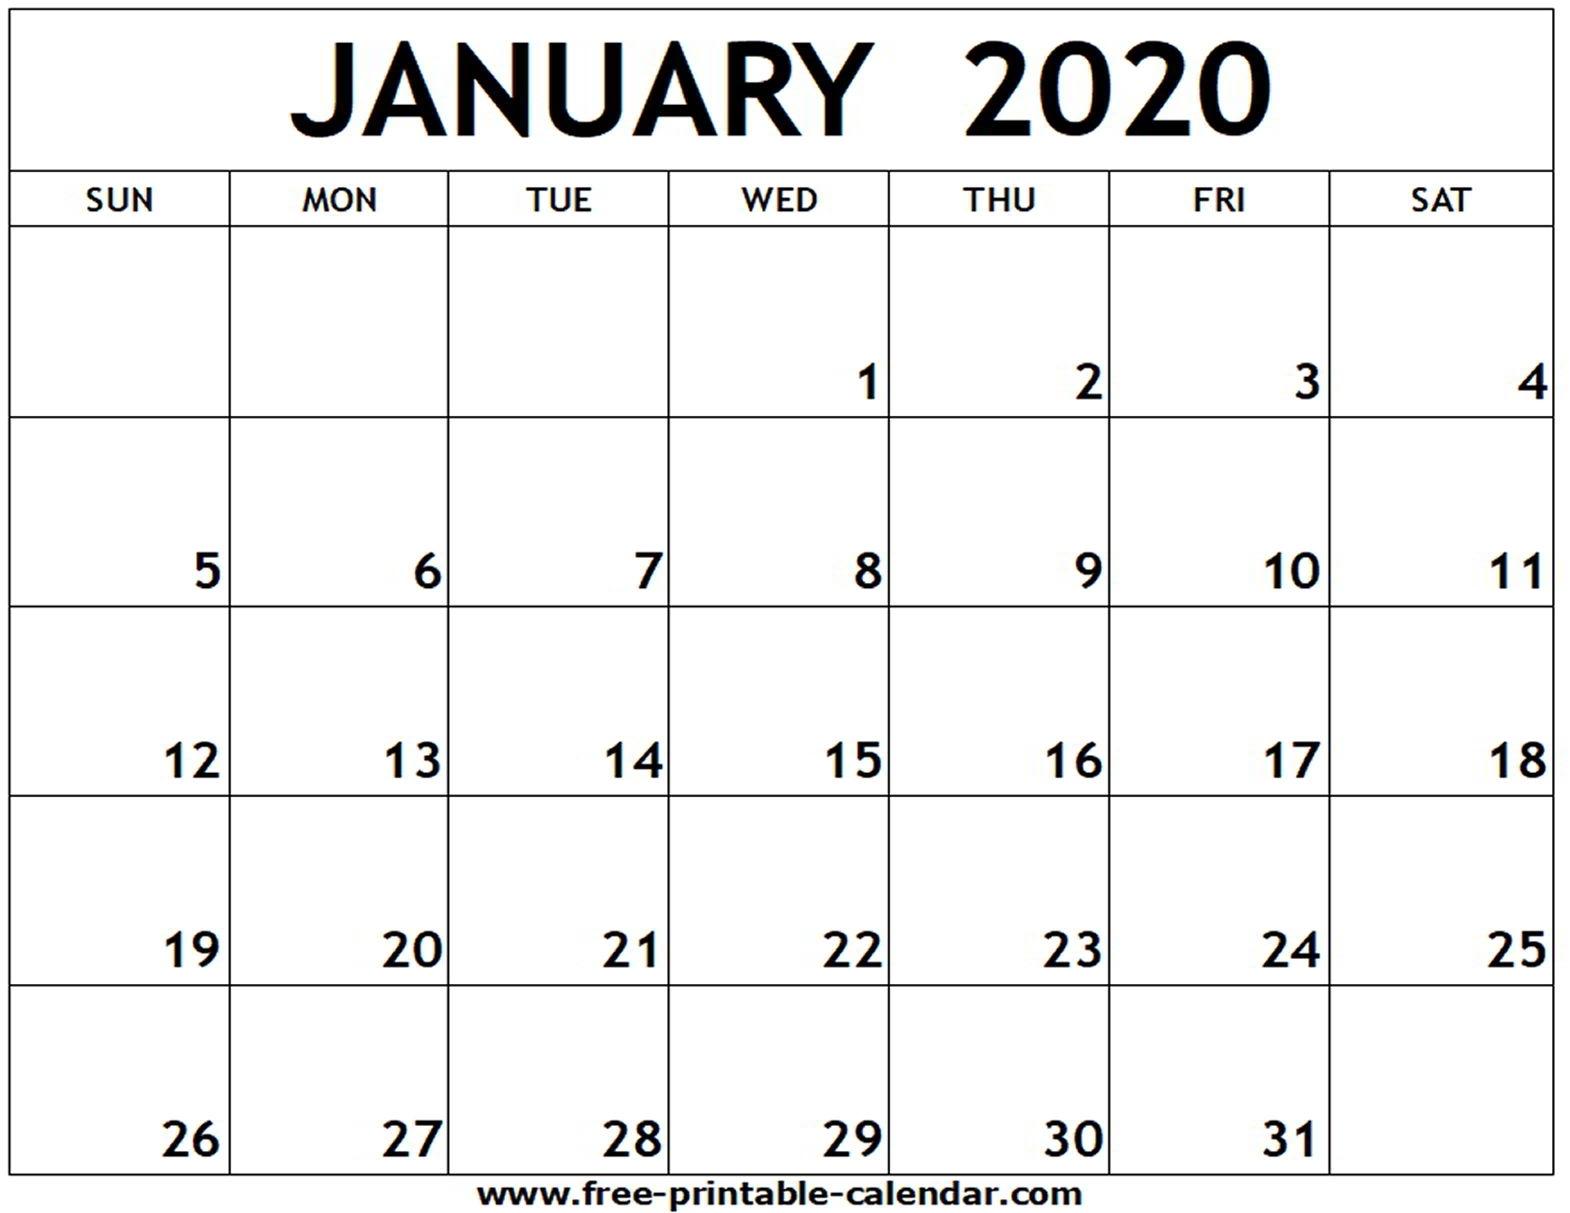 January 2020 Printable Calendar - Free-Printable-Calendar pertaining to Free Printable 2020 Calendar To I Can Edit